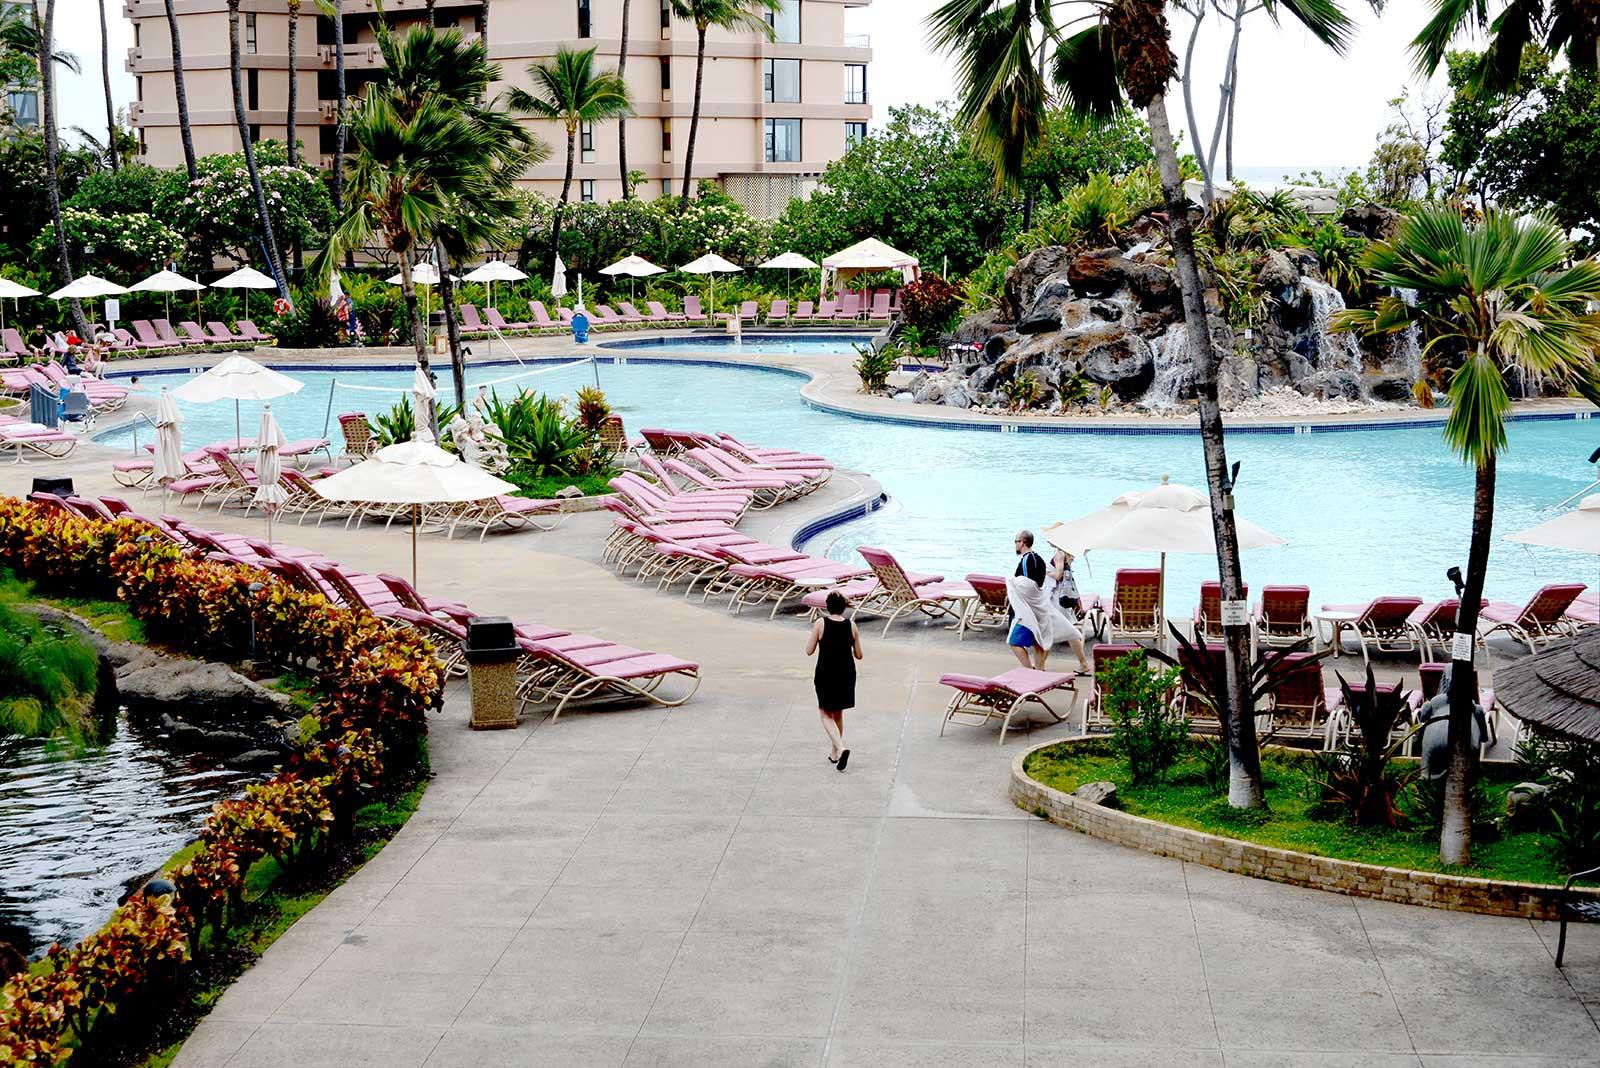 Diamond Resort Kaanapali Beach Club, Maui timeshare resales